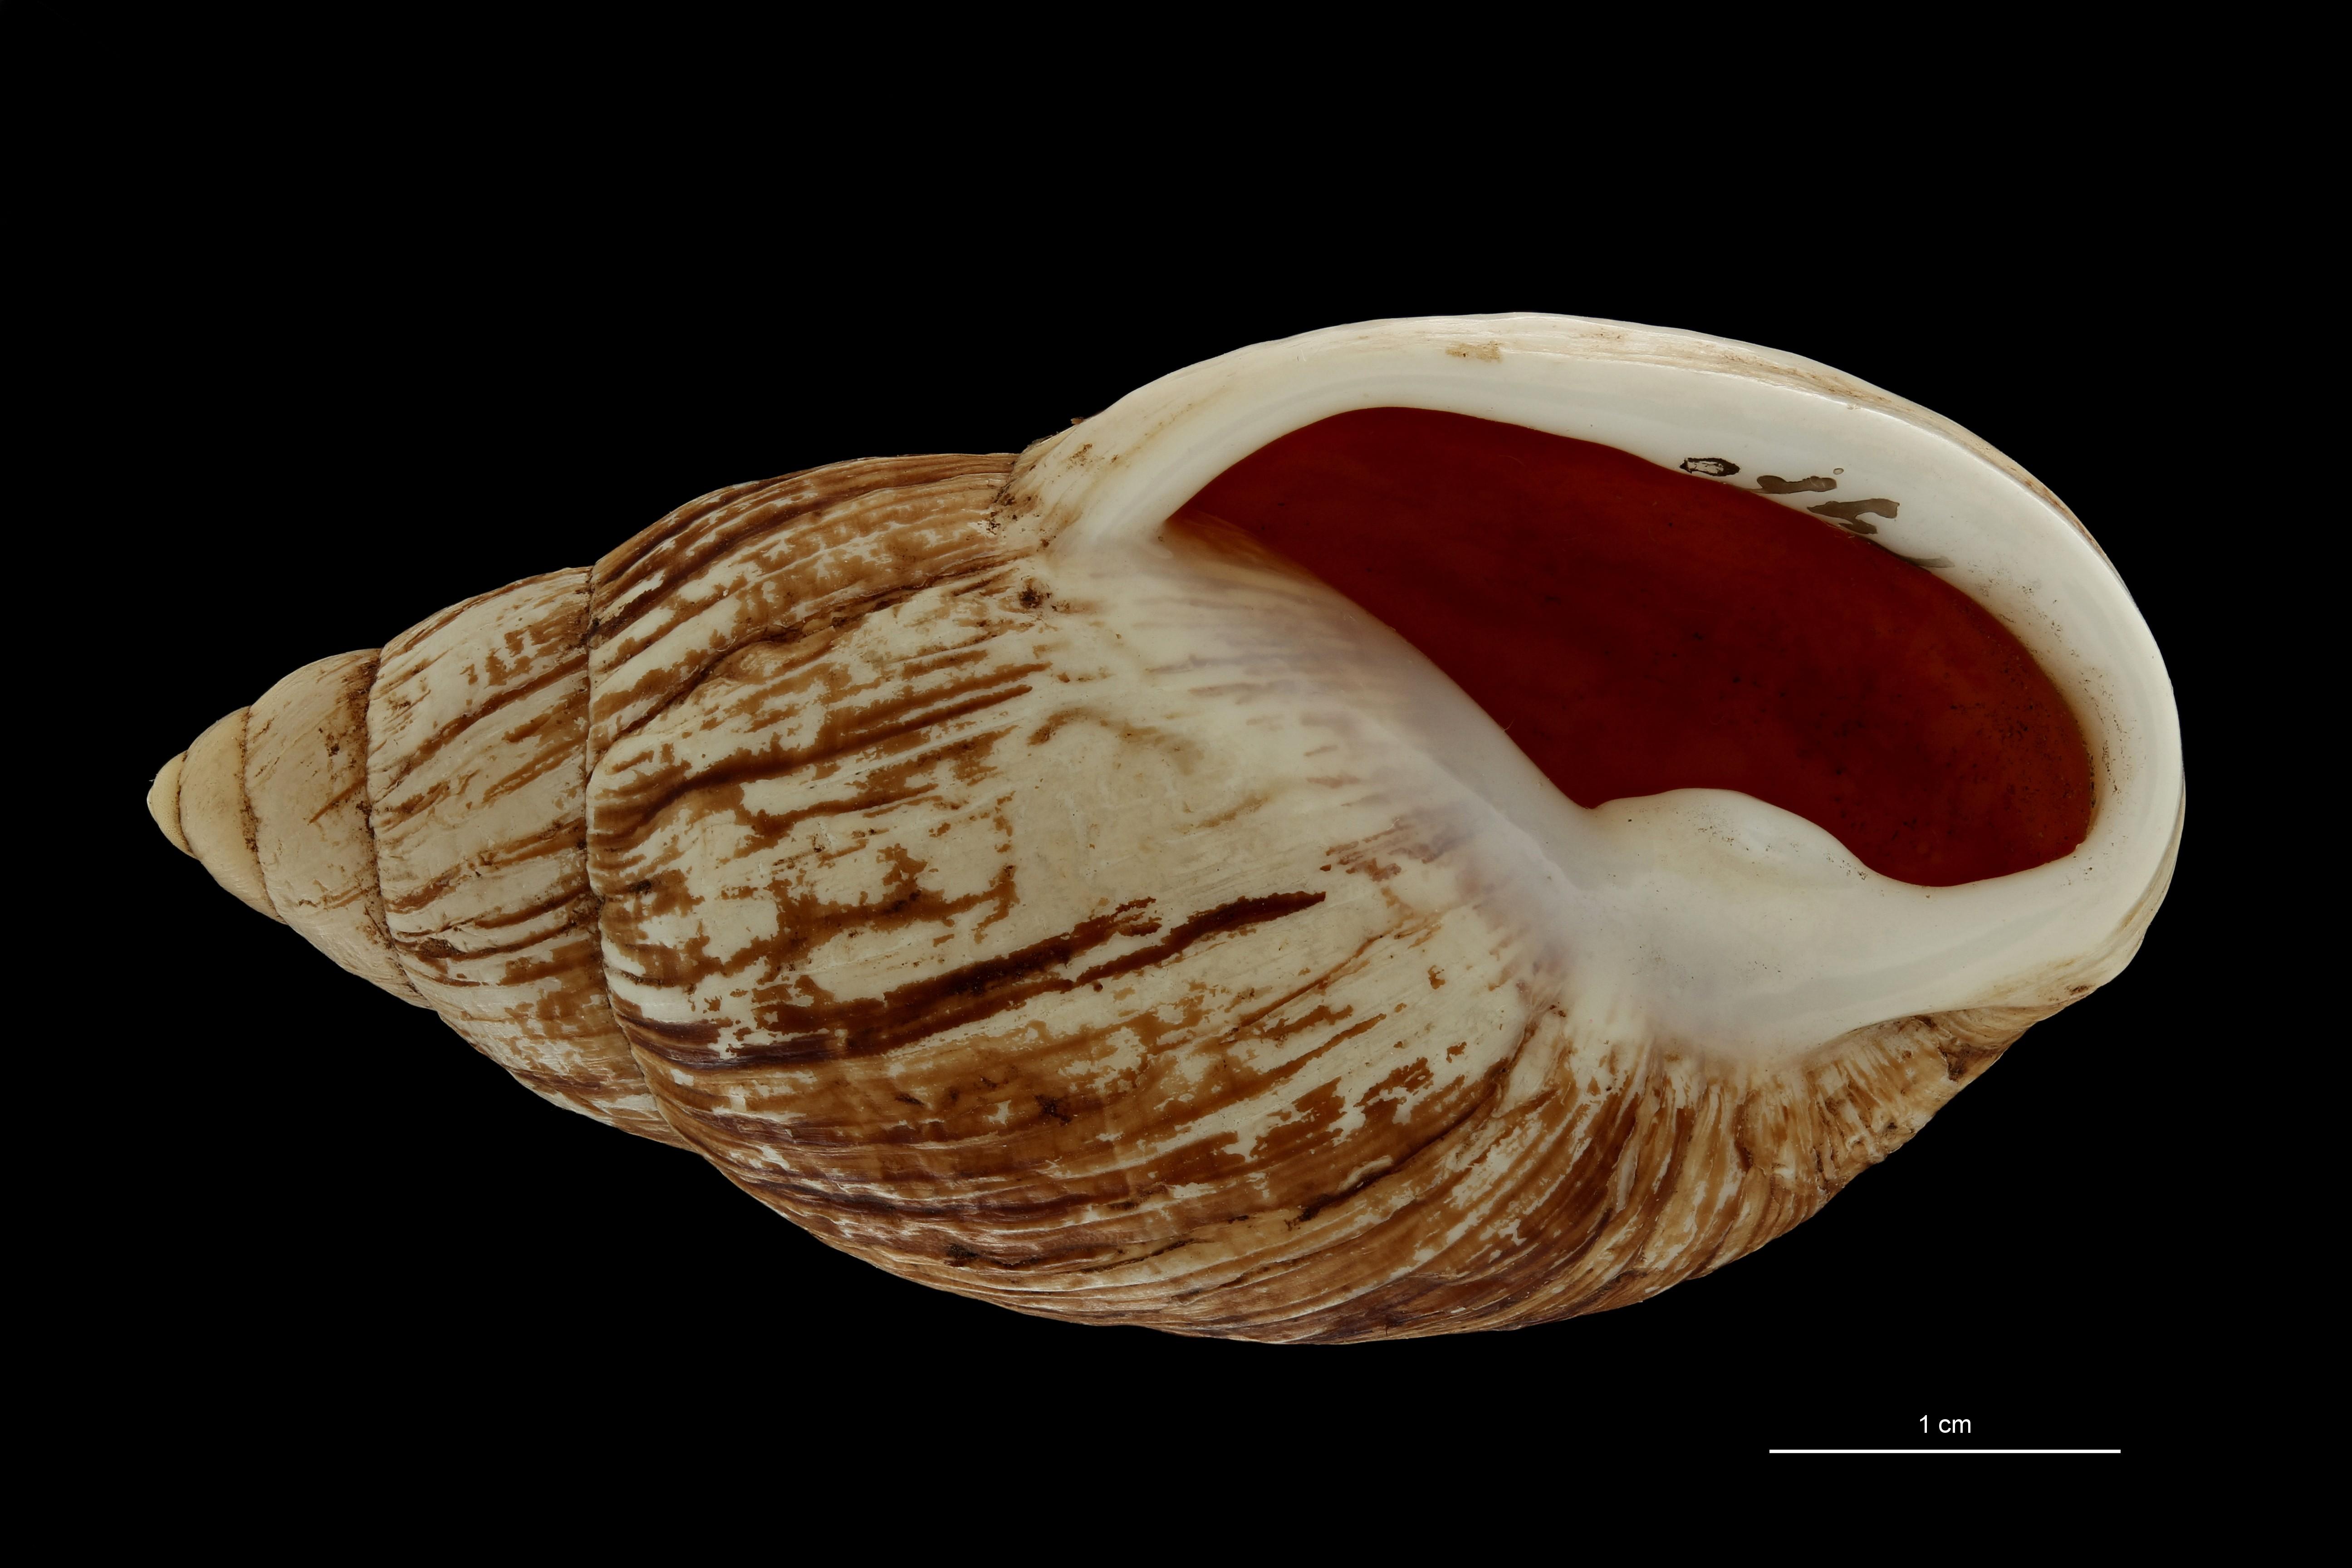 BE-RBINS-INV MT 703 Placostylus porphyrostomus var. nana Type V ZS PMax Scaled.jpg